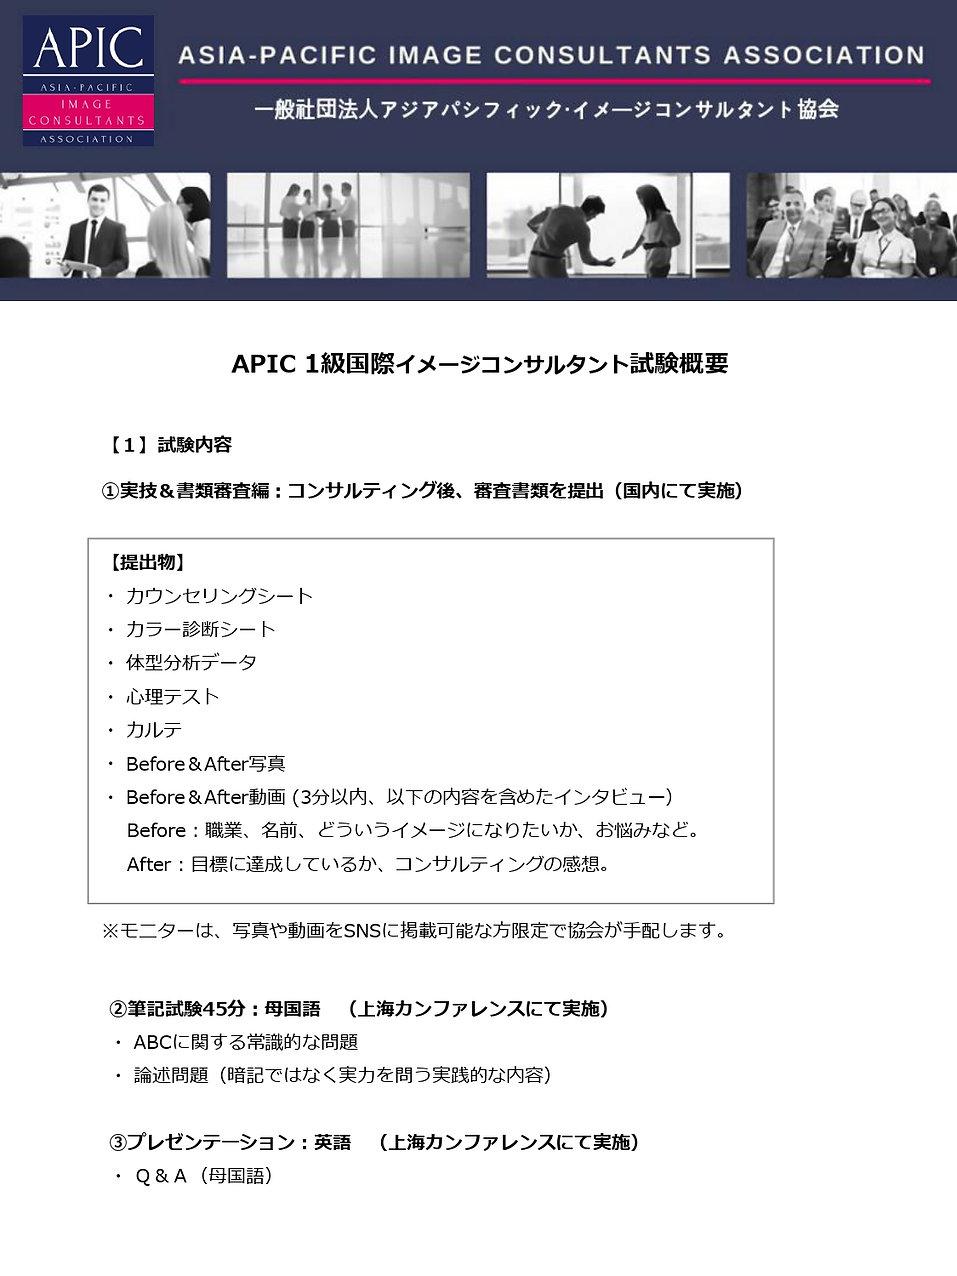 APIC1級試験概要_page-0001.jpg